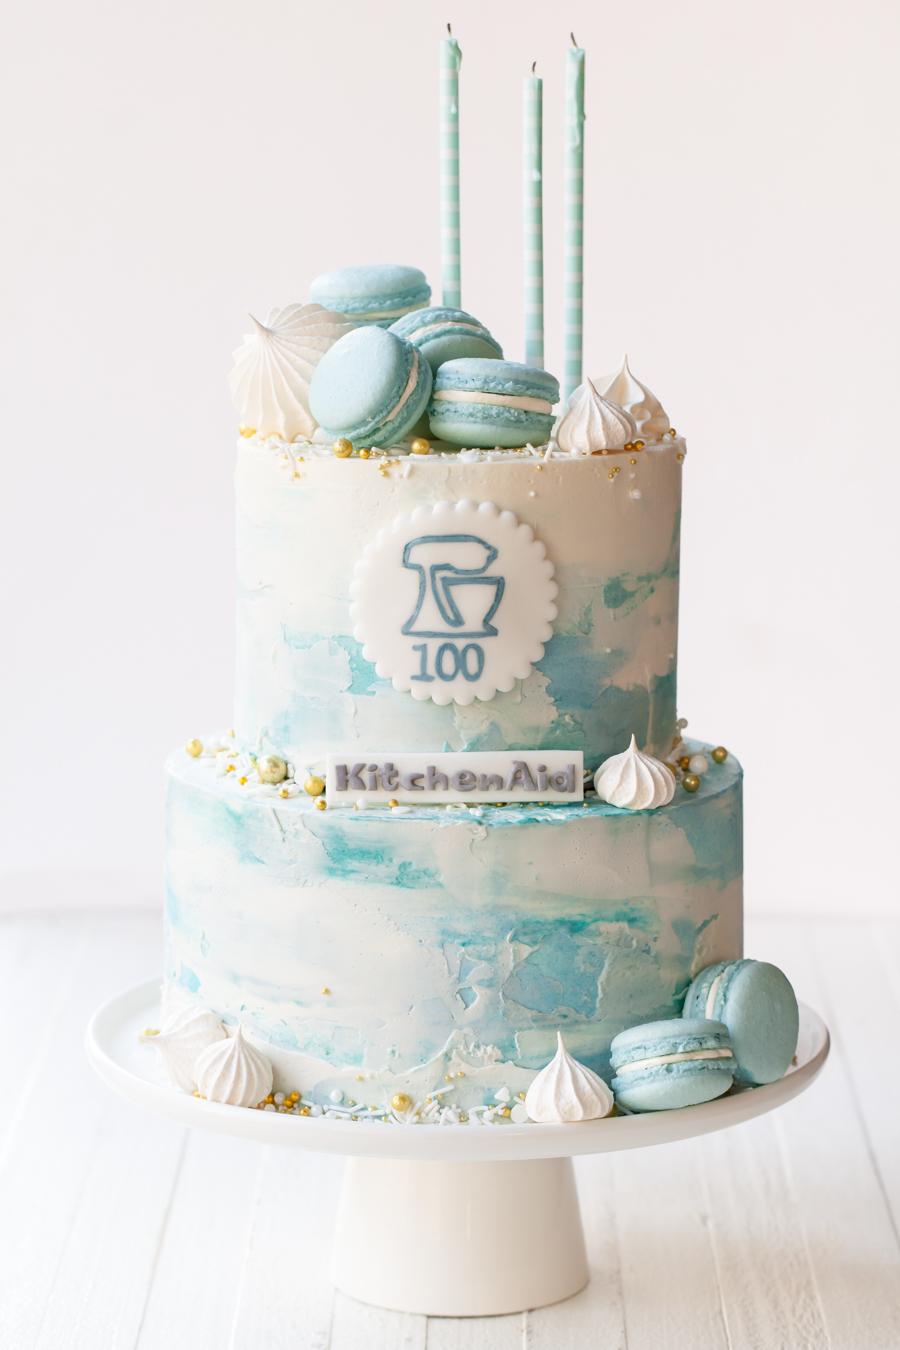 Kitchen Aid 100th Anniversary Cake